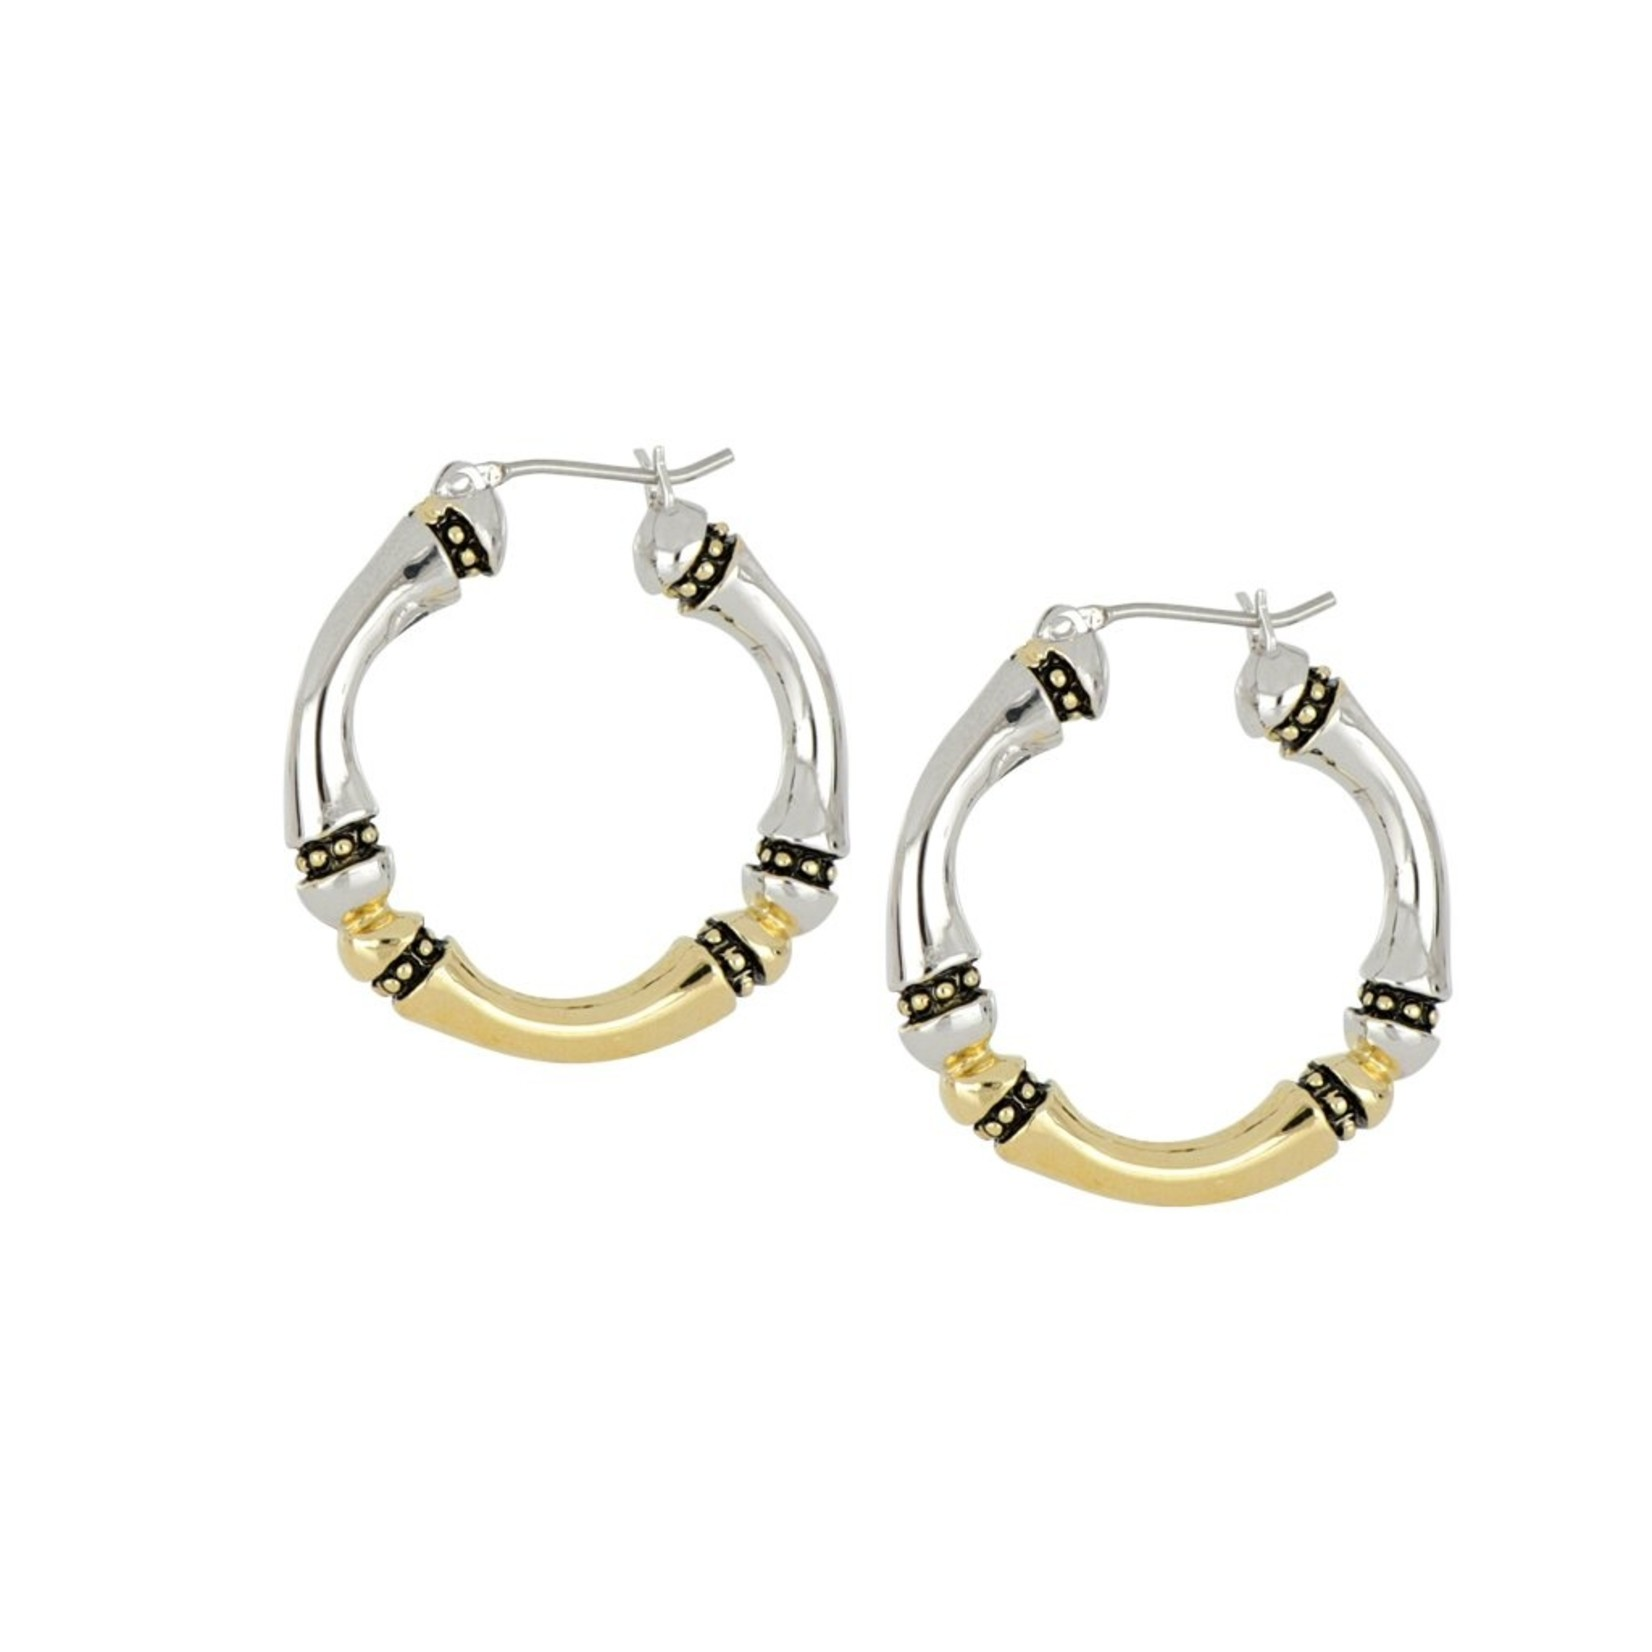 John Medeiros John Medeiros Canias Collection Large Hoop Earring